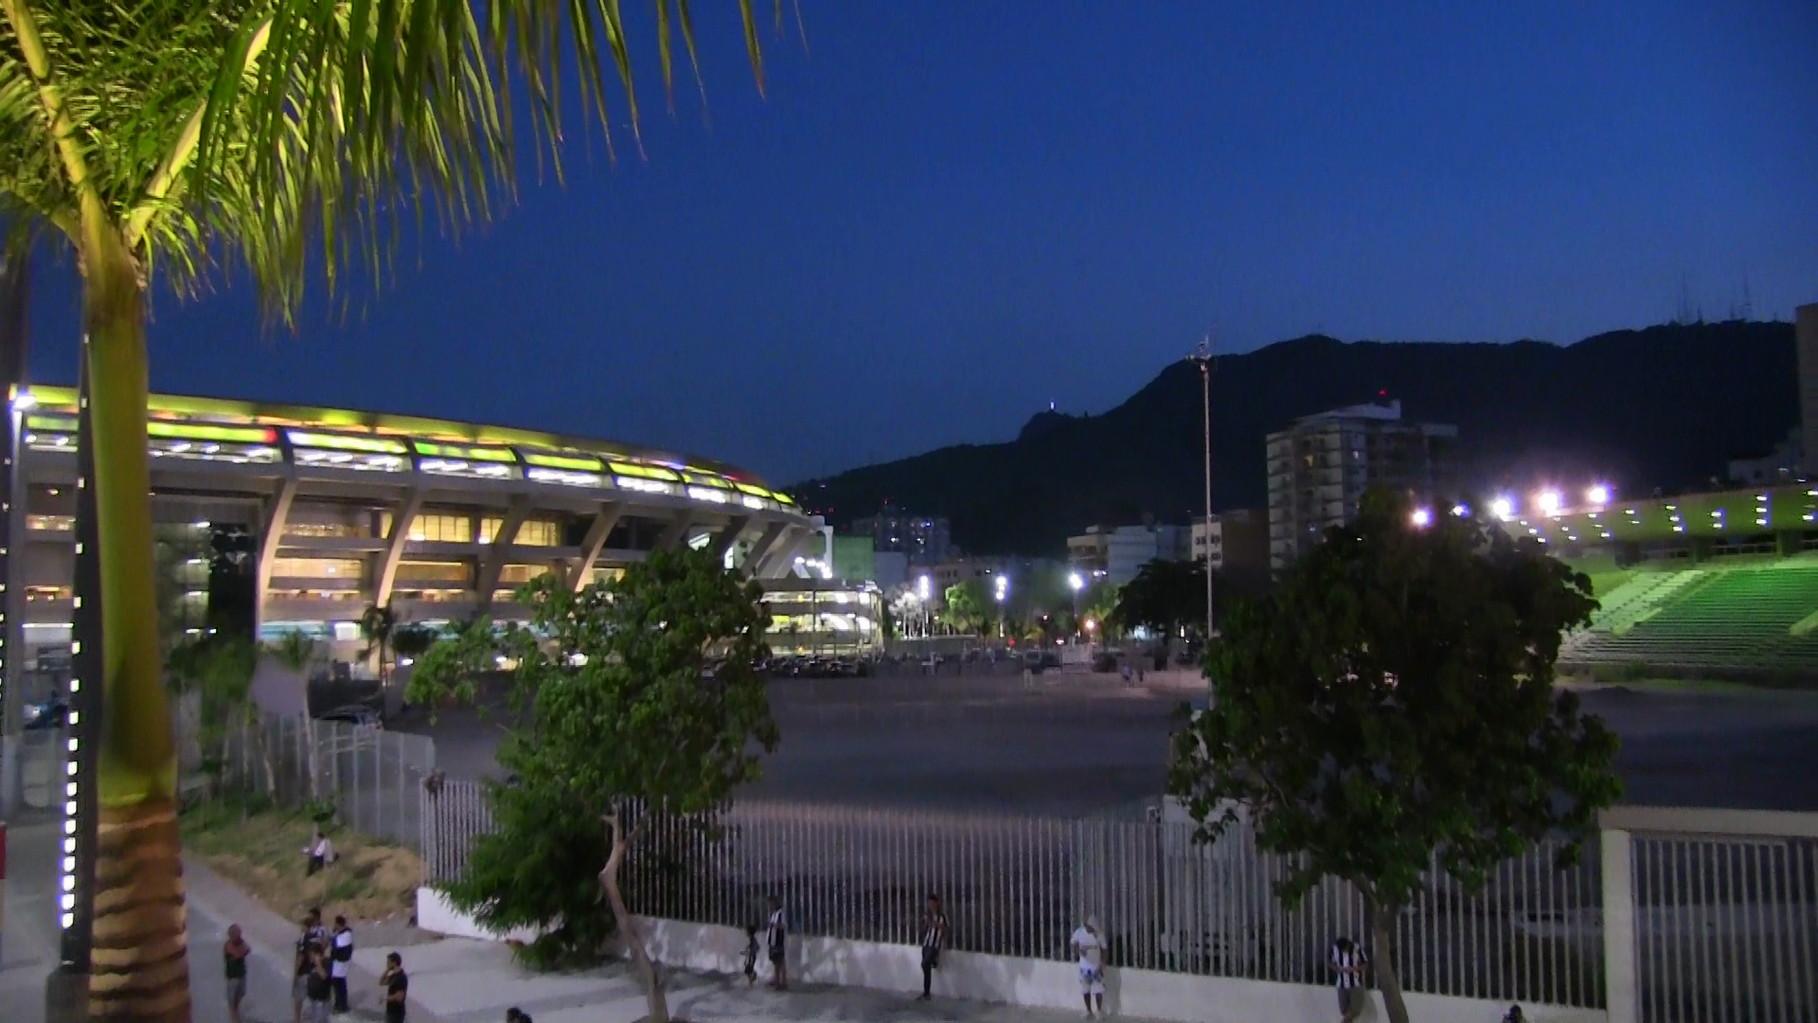 Le stade Maracanã